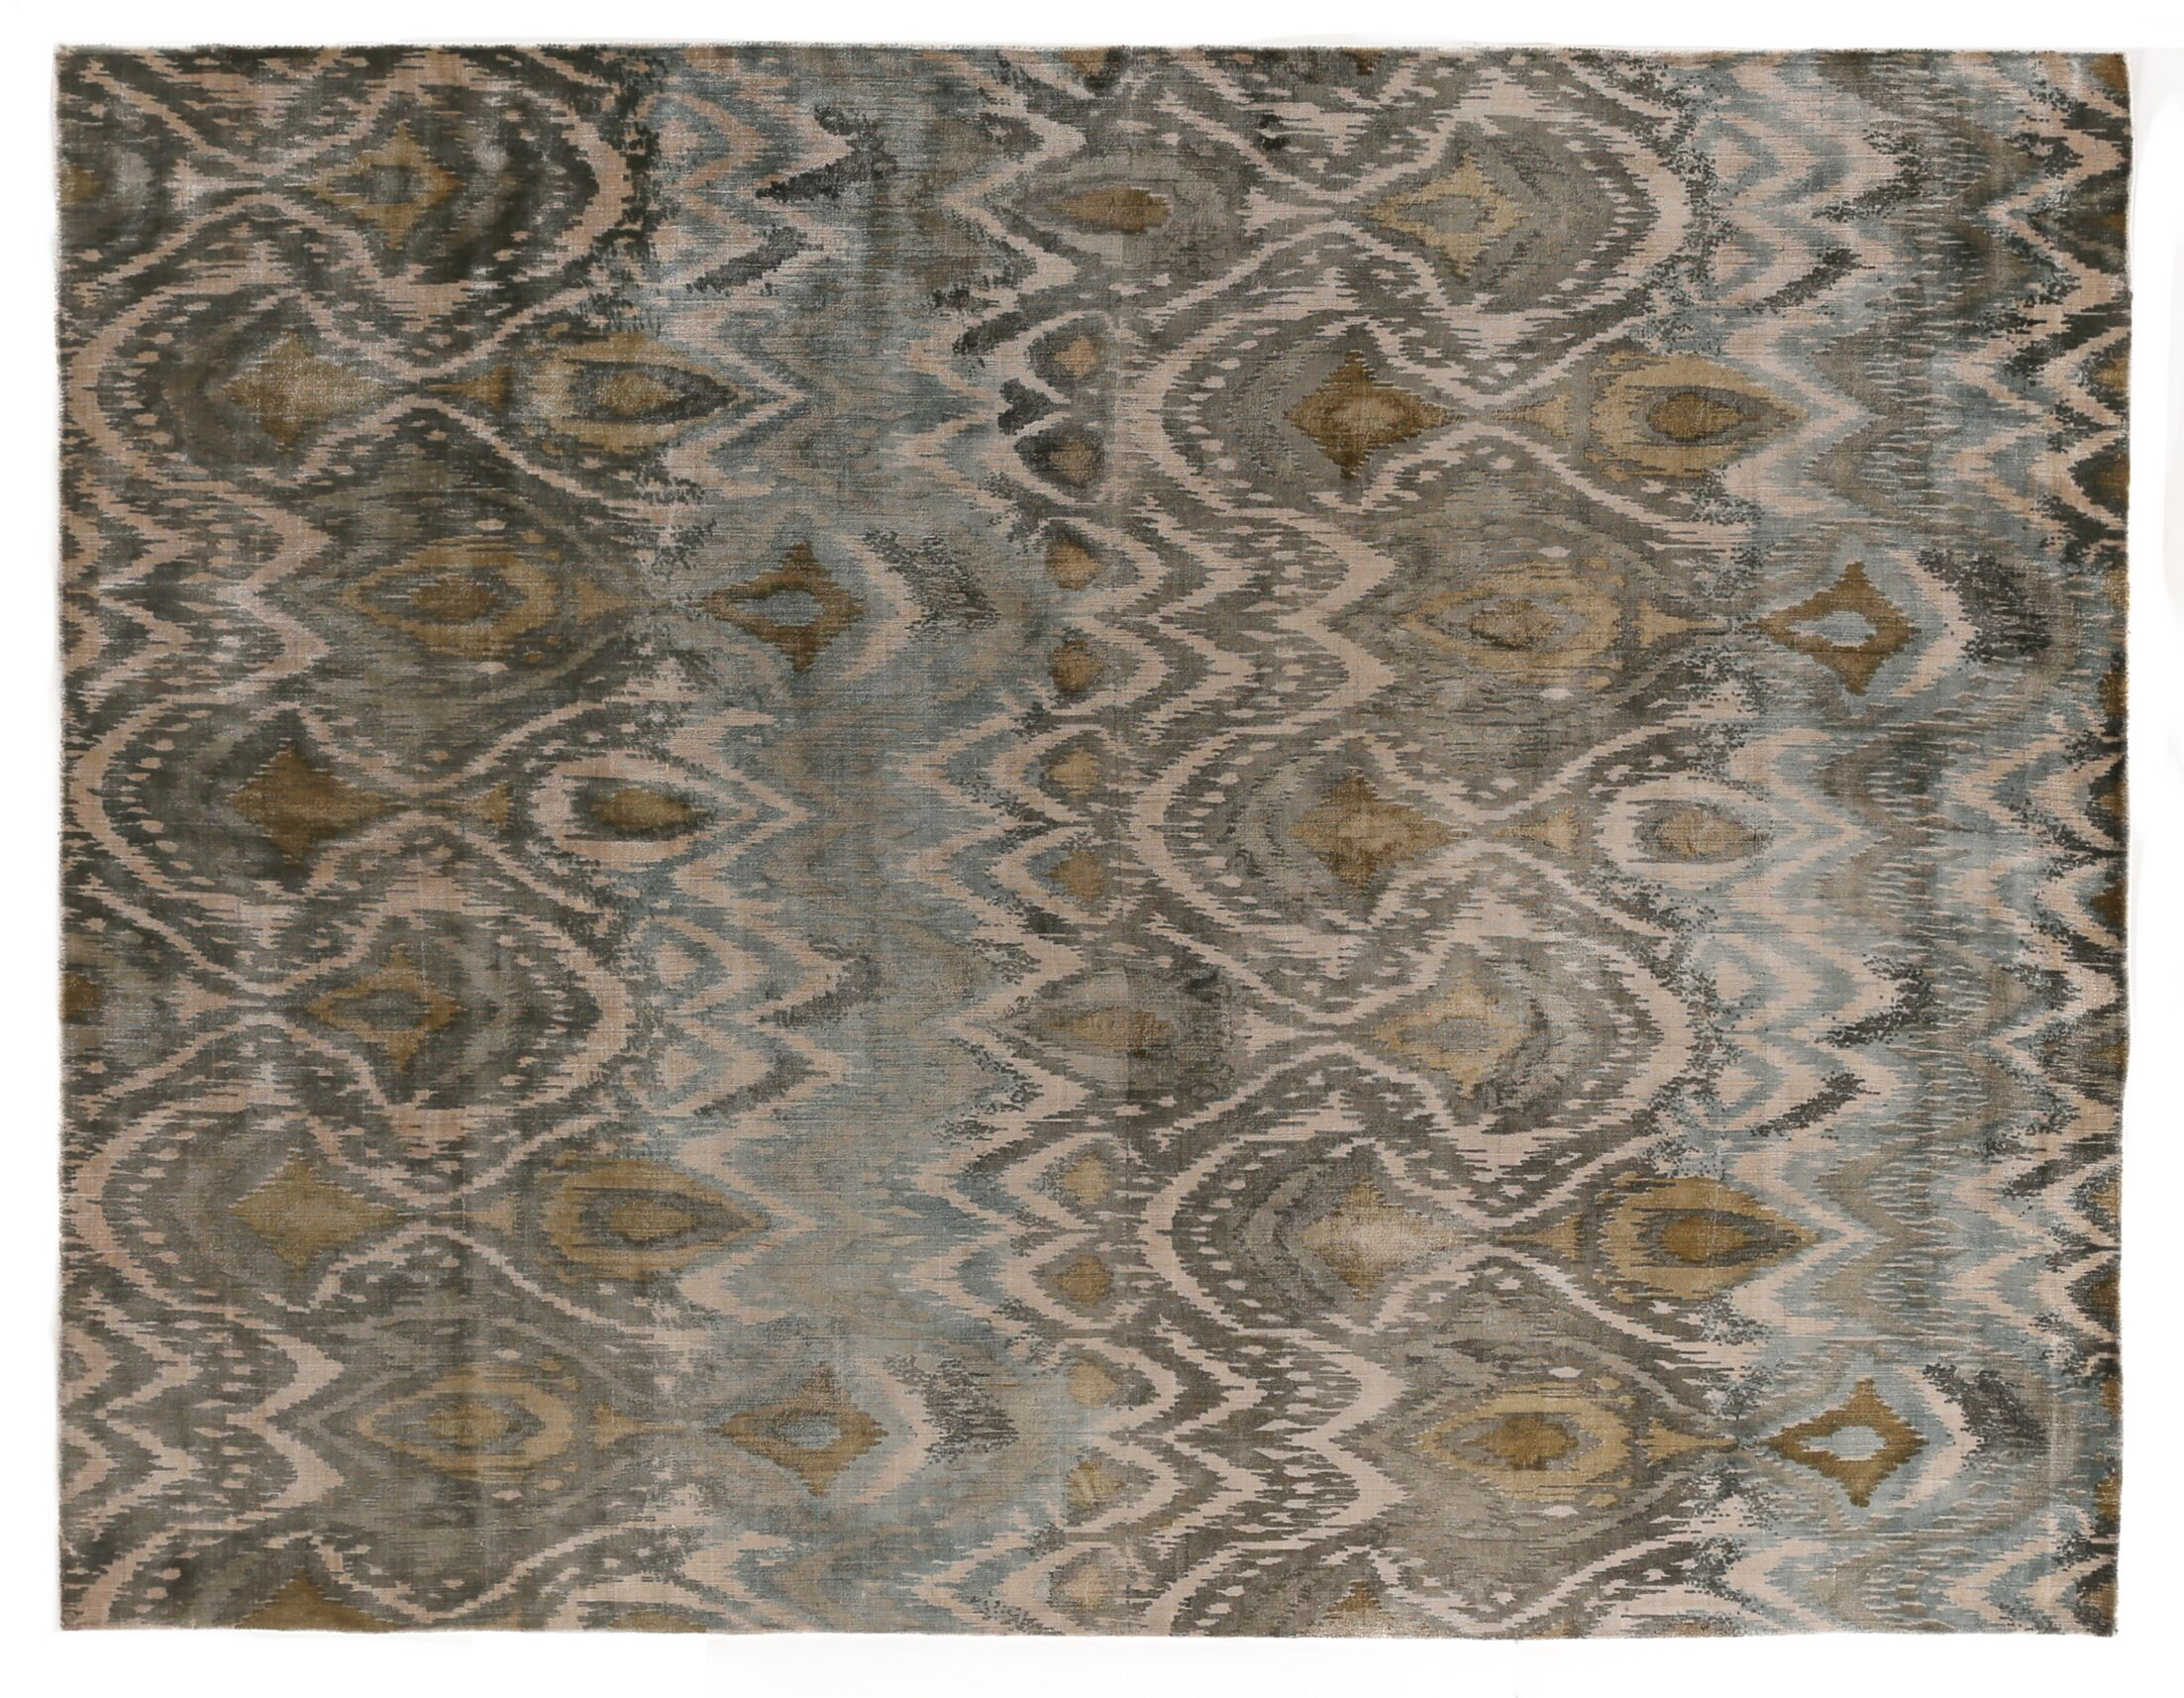 Koda Hand-Woven Gray Area Rug Rug Size: Rectangle 9' x 12'